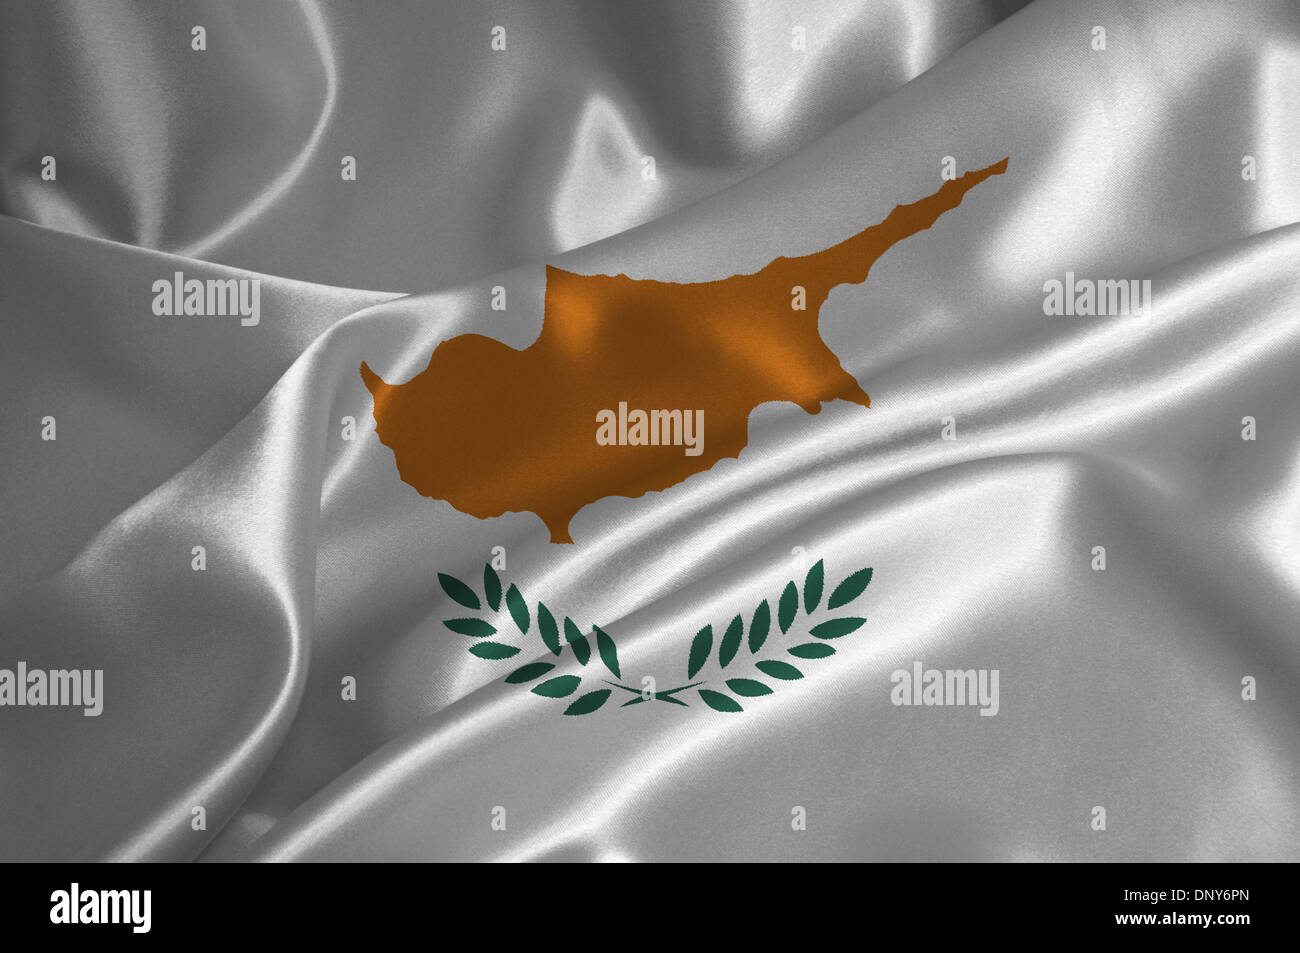 Cyprus flag on satin texture. - Stock Image